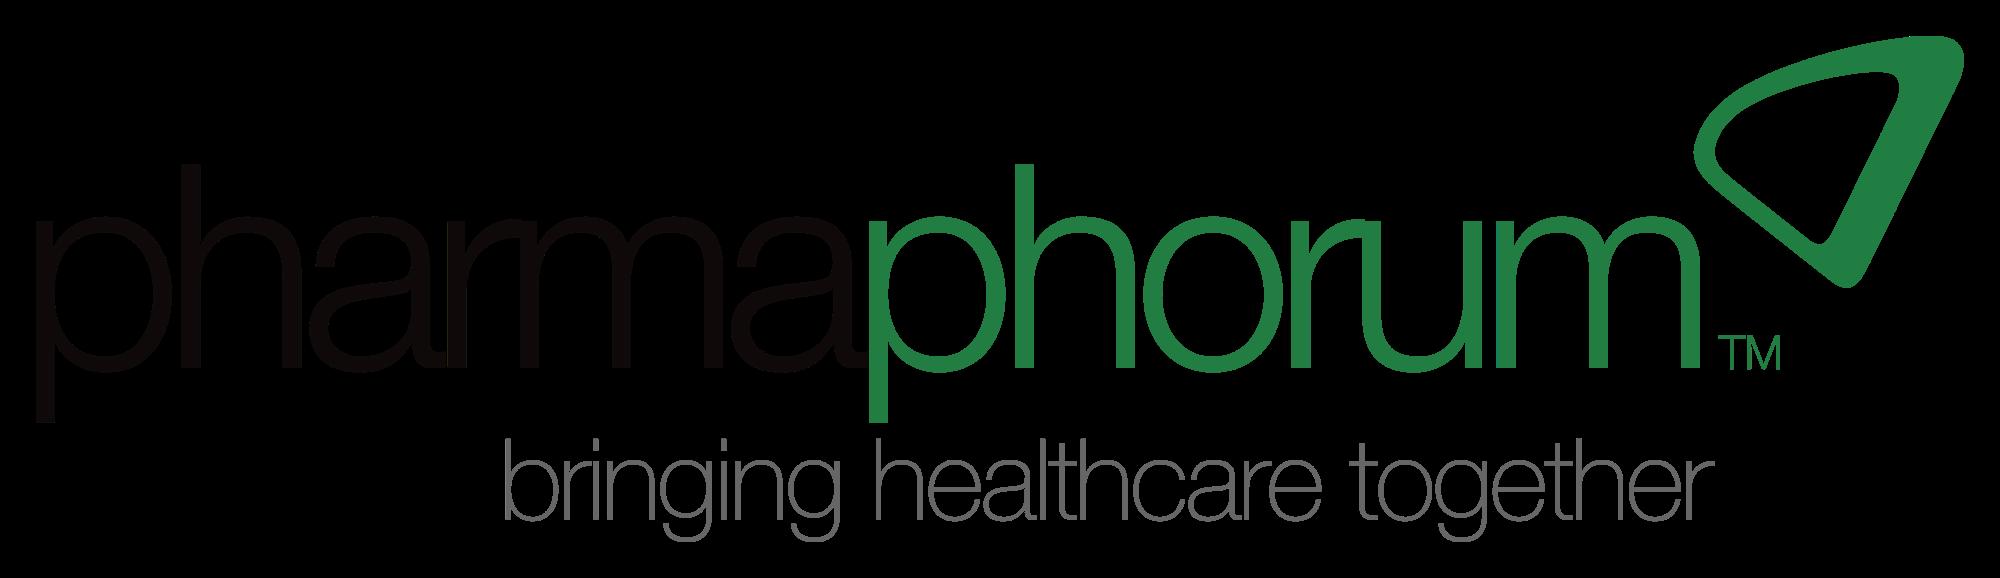 Pharmaphorum logo. Hyfe - Talk to a clinical trial expert